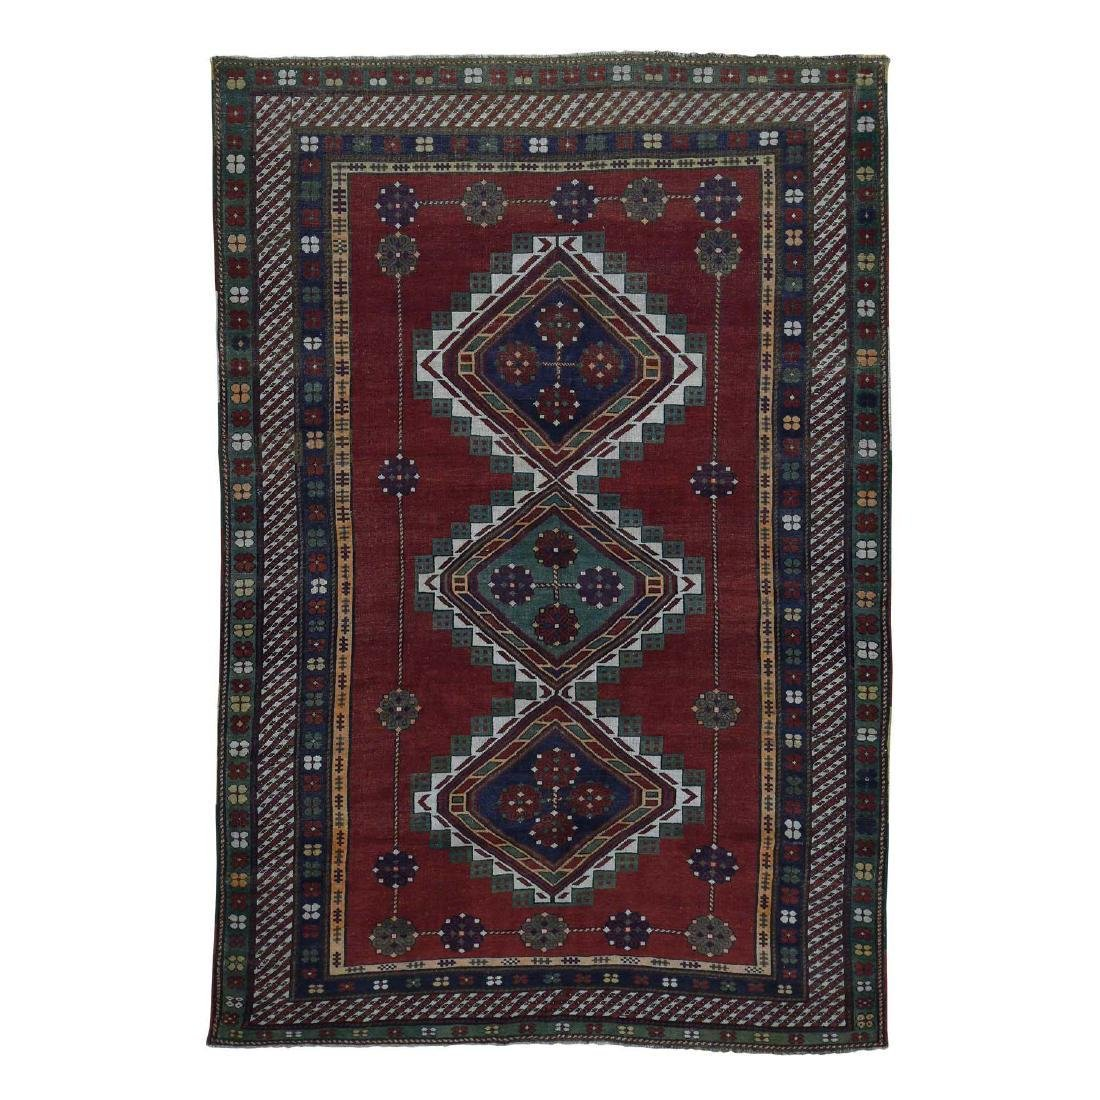 Antique Caucasian Kazak Good Condition Hand Knotted Rug